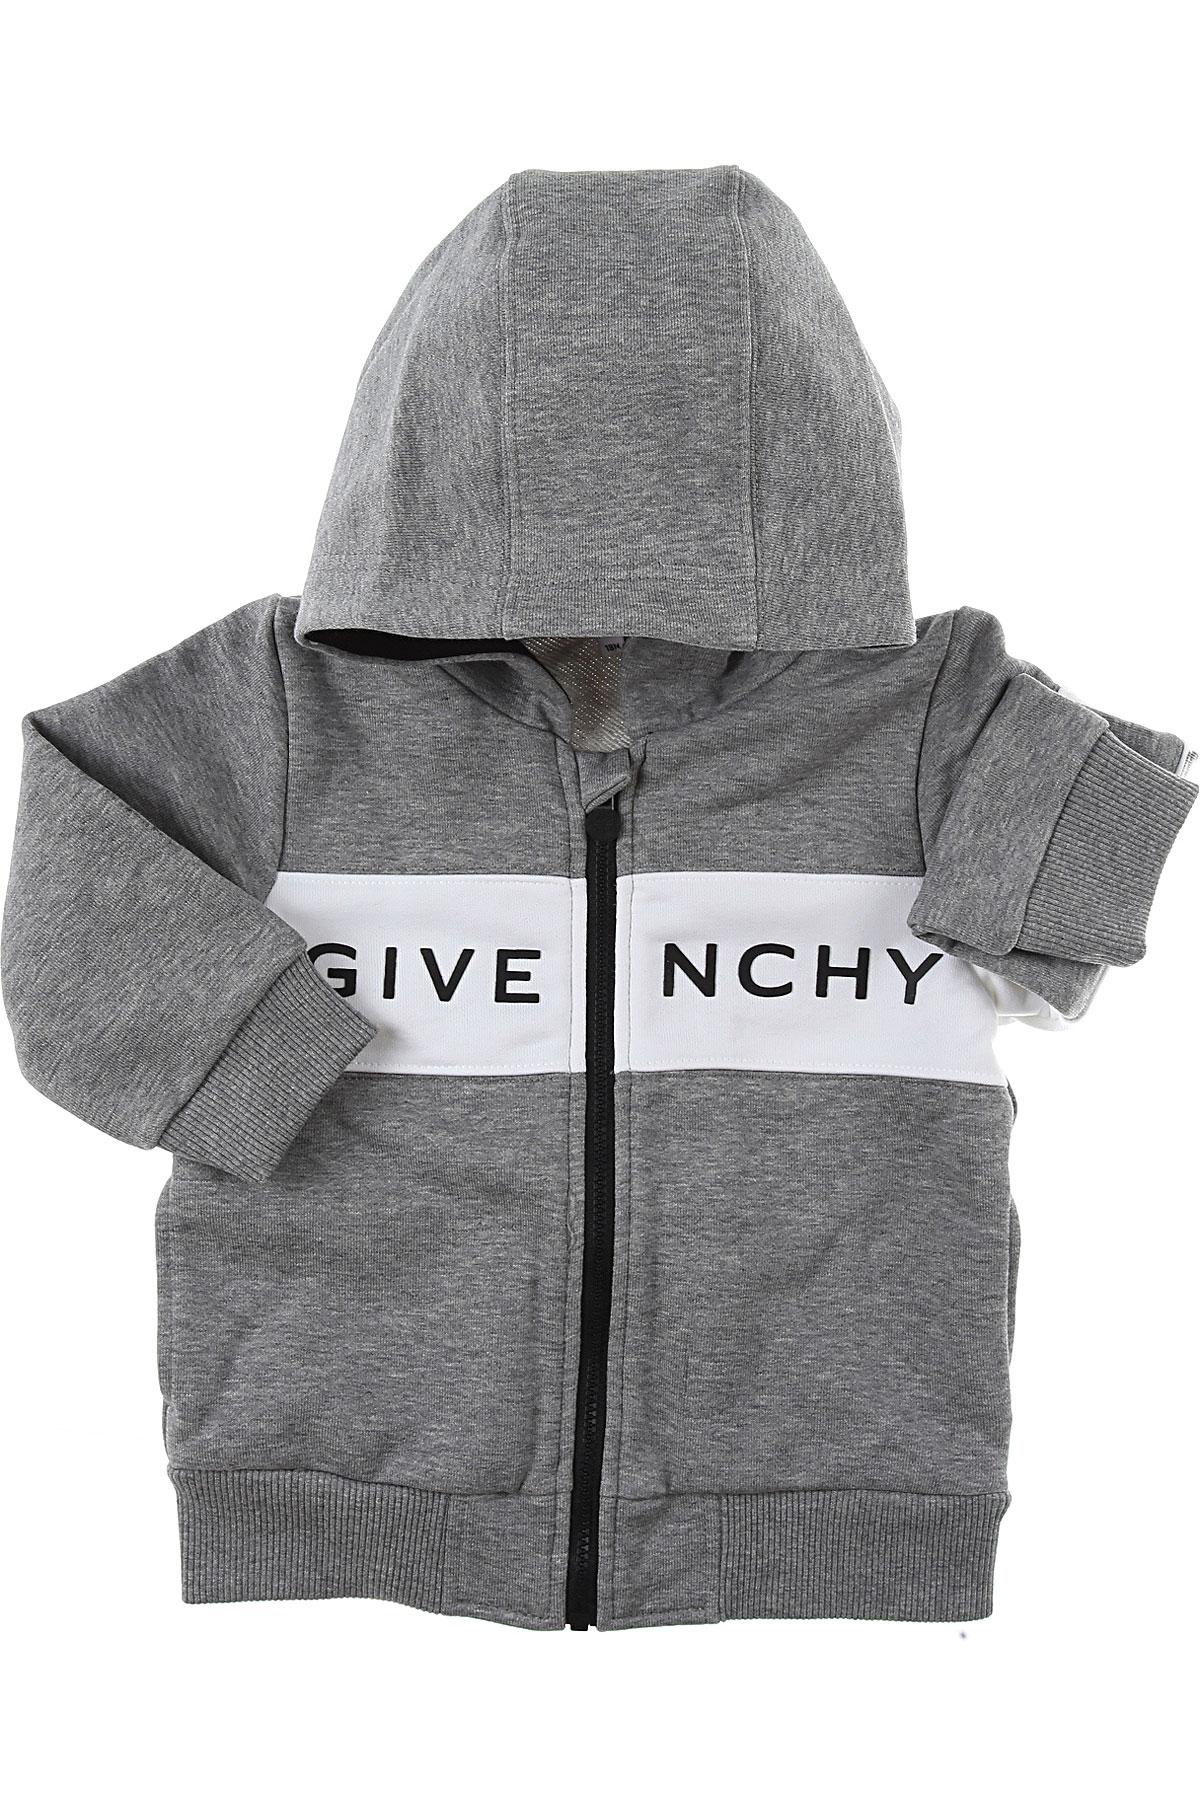 Givenchy Baby Sweatshirts & Hoodies for Boys On Sale, Grey, Cotton, 2019, 12 M 18M 2Y 3Y 9M